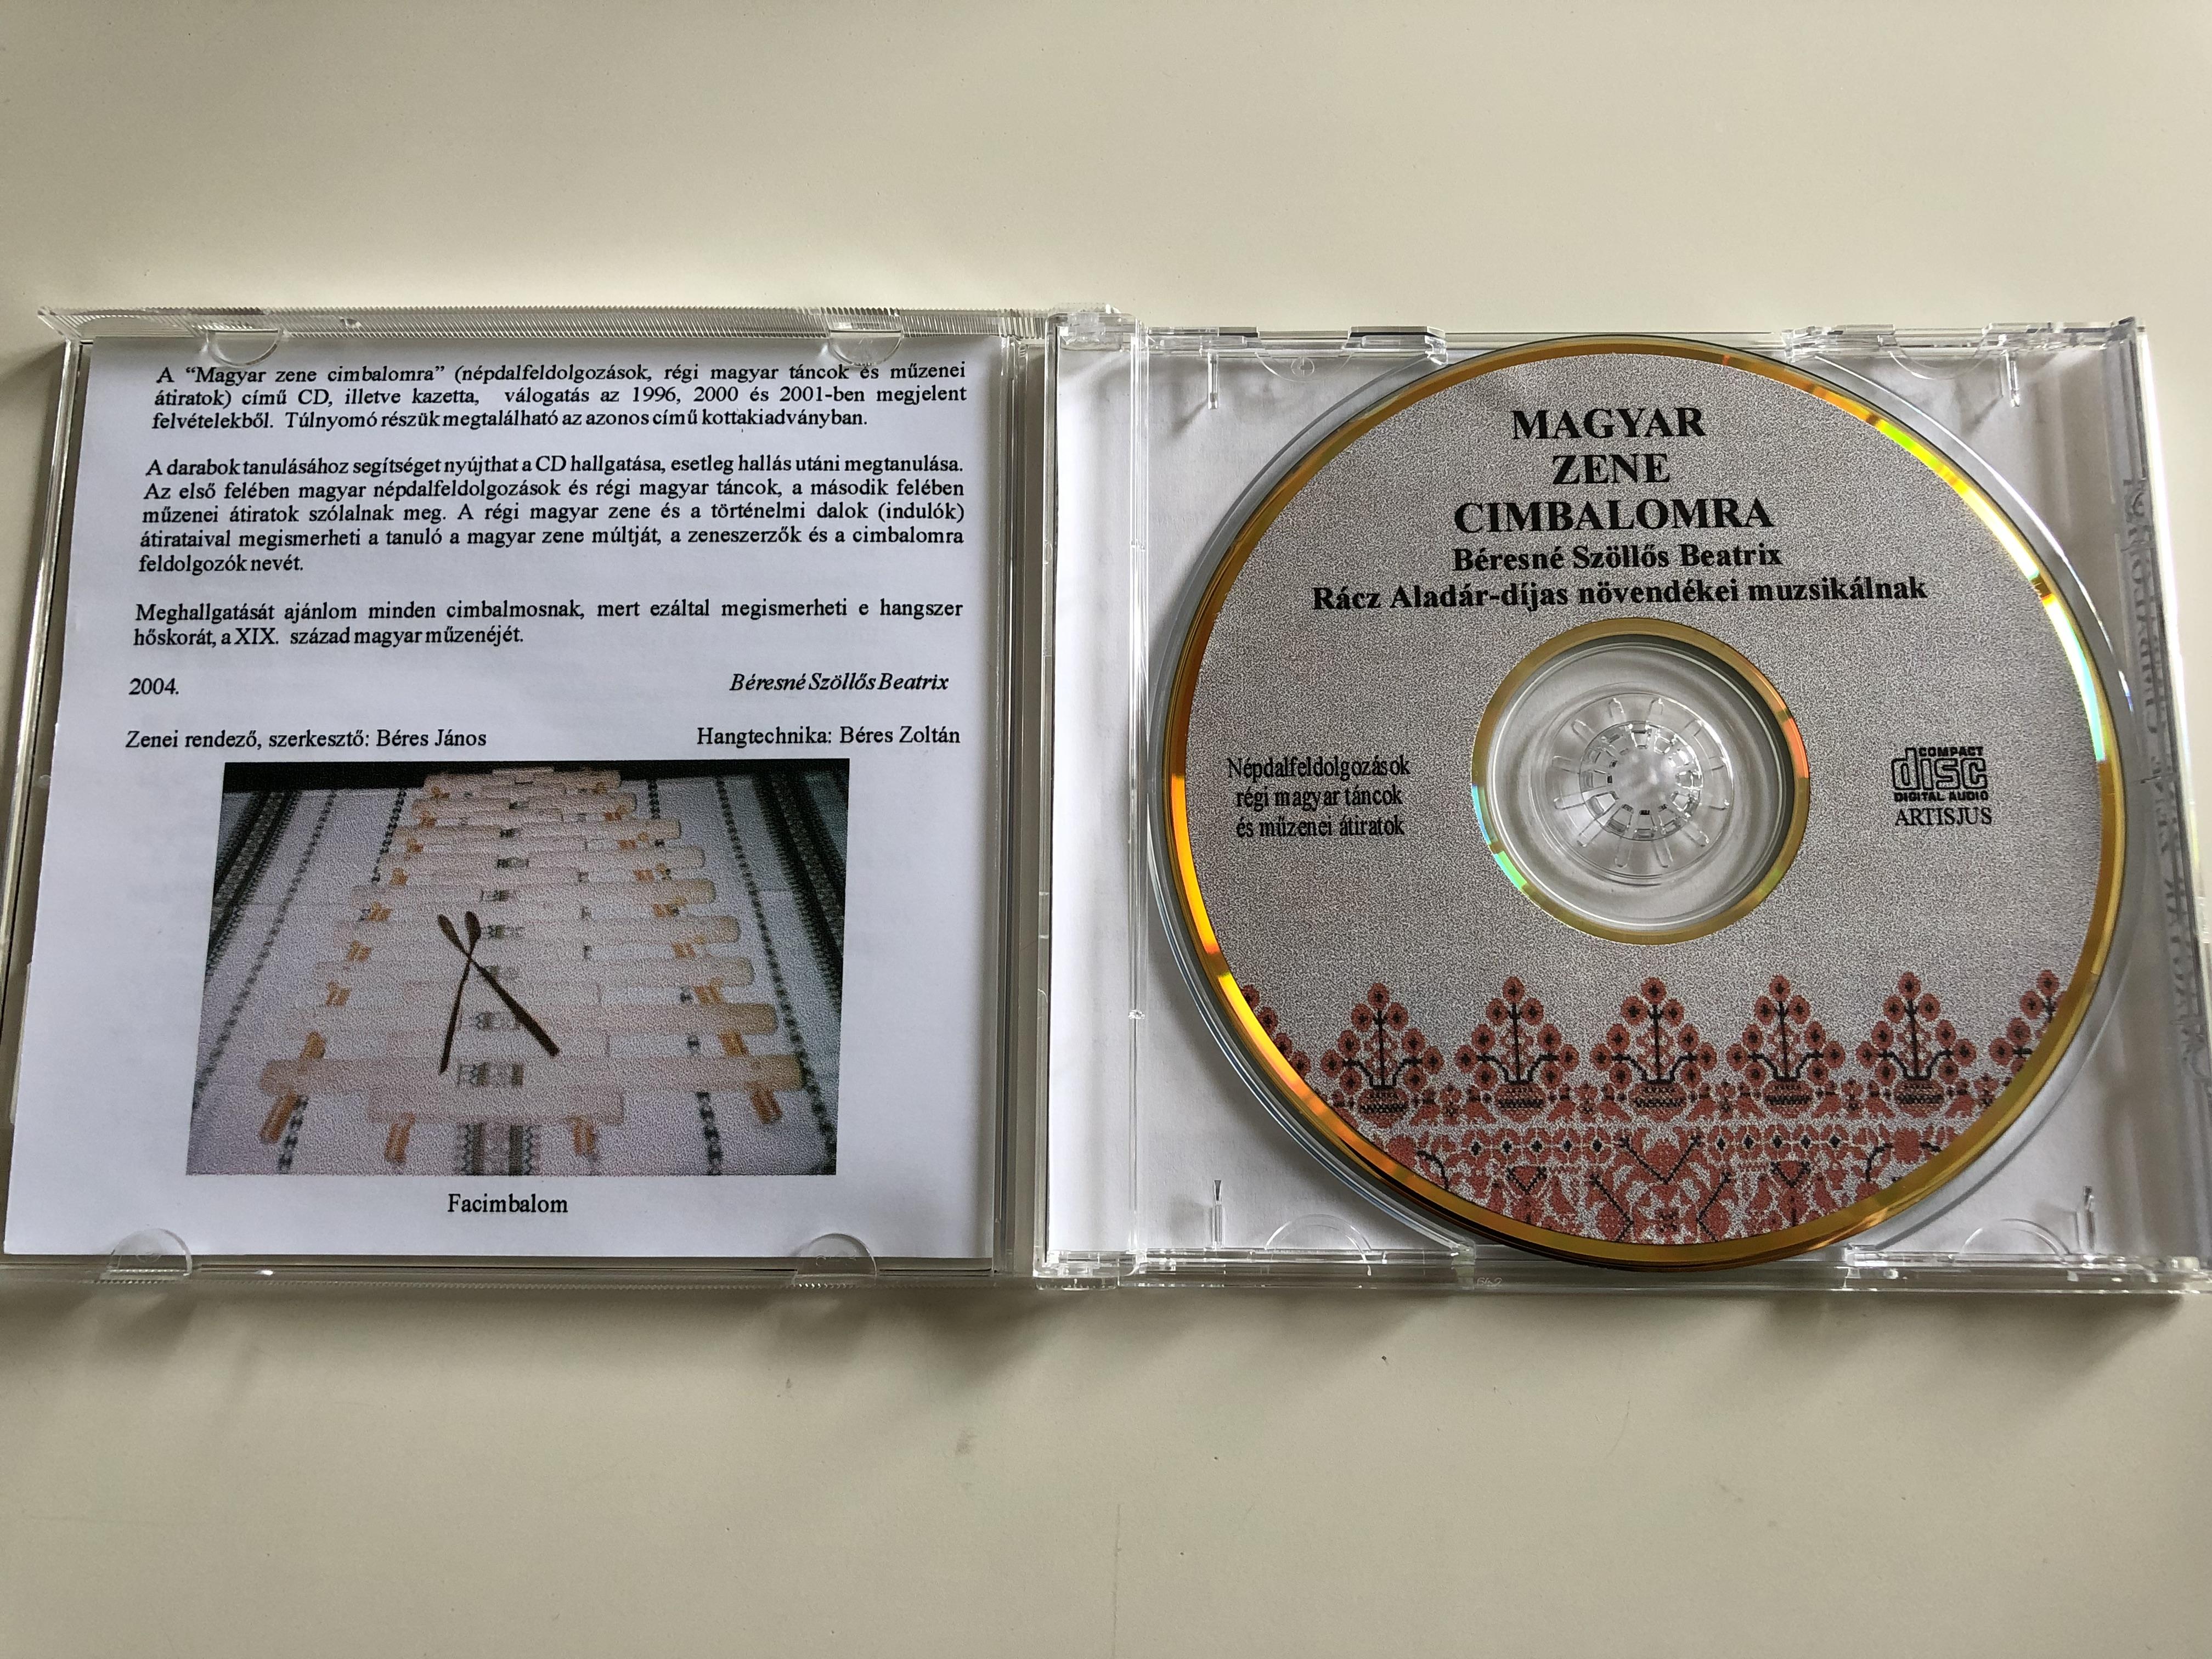 magyar-zene-cimbalomra-n-pdalfeldolgoz-sok-r-gi-magyar-t-ncok-s-m-zenei-tiratok-b-resn-sz-ll-beatrix-r-cz-alad-r-d-jas-n-vend-kei-muzsik-lnak-audio-cd-2004-4-.jpg